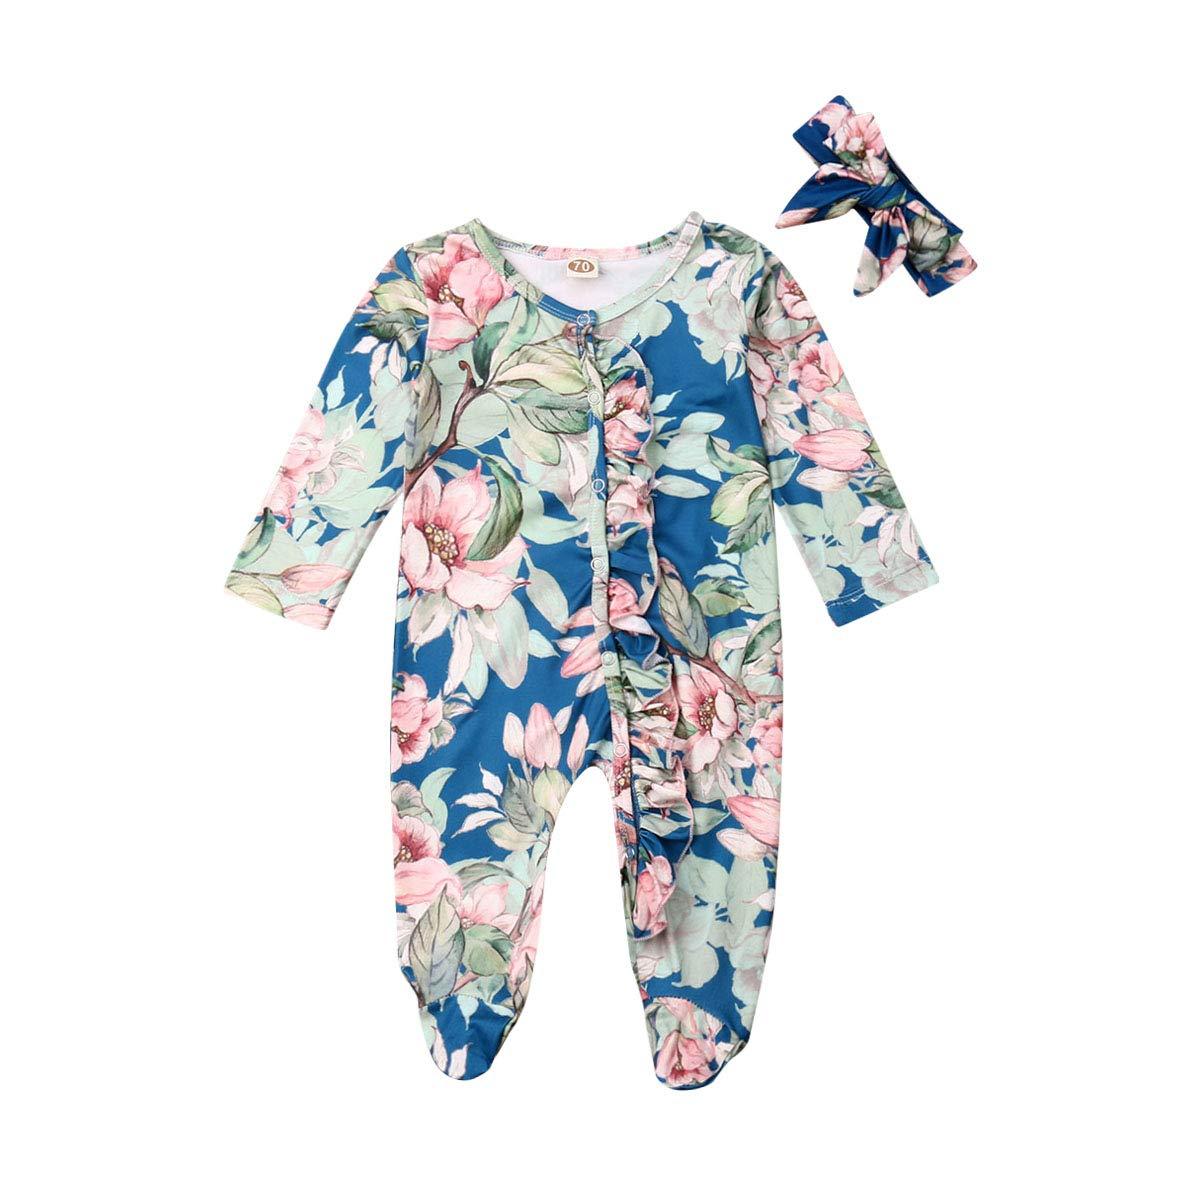 Baby Printed Footed Pajamas Headband Newborn Unisex Boys Girls Cotton Sleeper Long Sleeve Jumpsuit Set 2Pcs